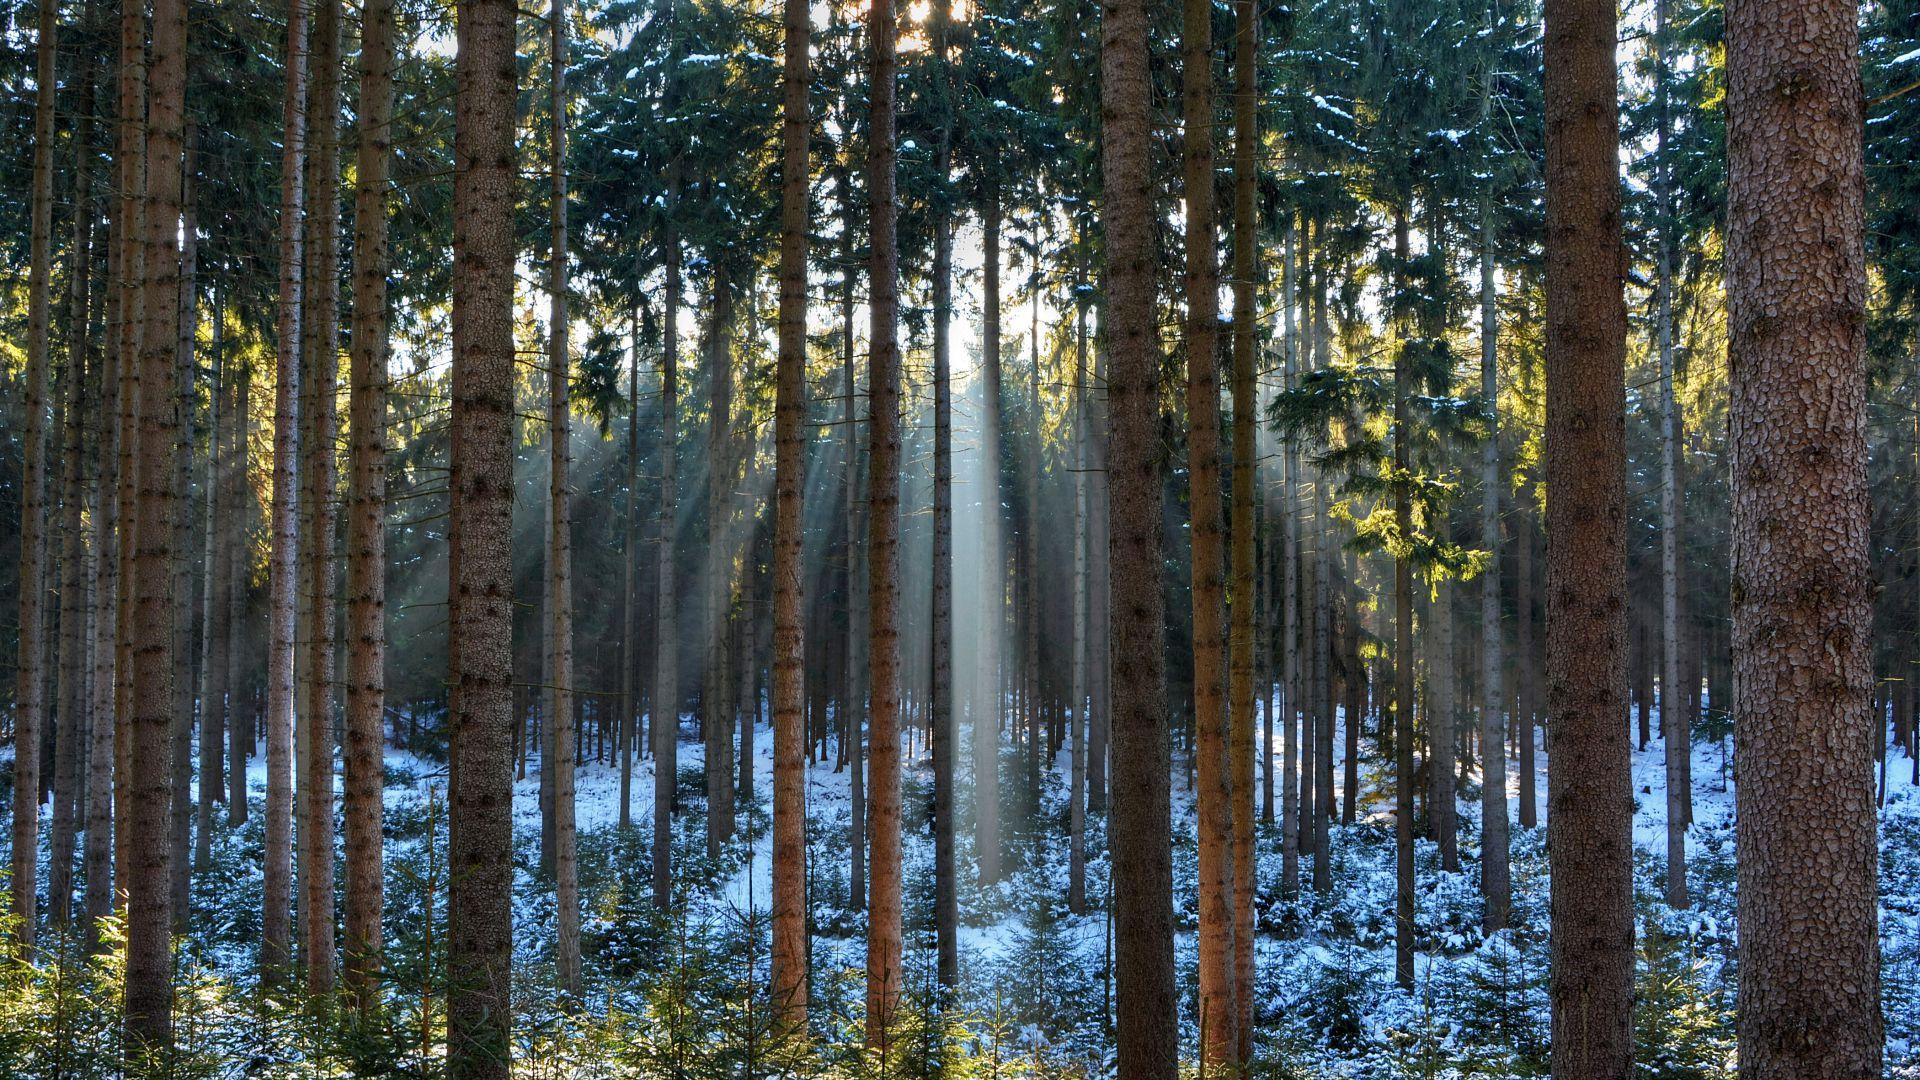 Forest 4k Quality Iphone Wallpaper: Wallpaper Pines, 5k, 4k Wallpaper, Wood, Sunlight, Sunrise